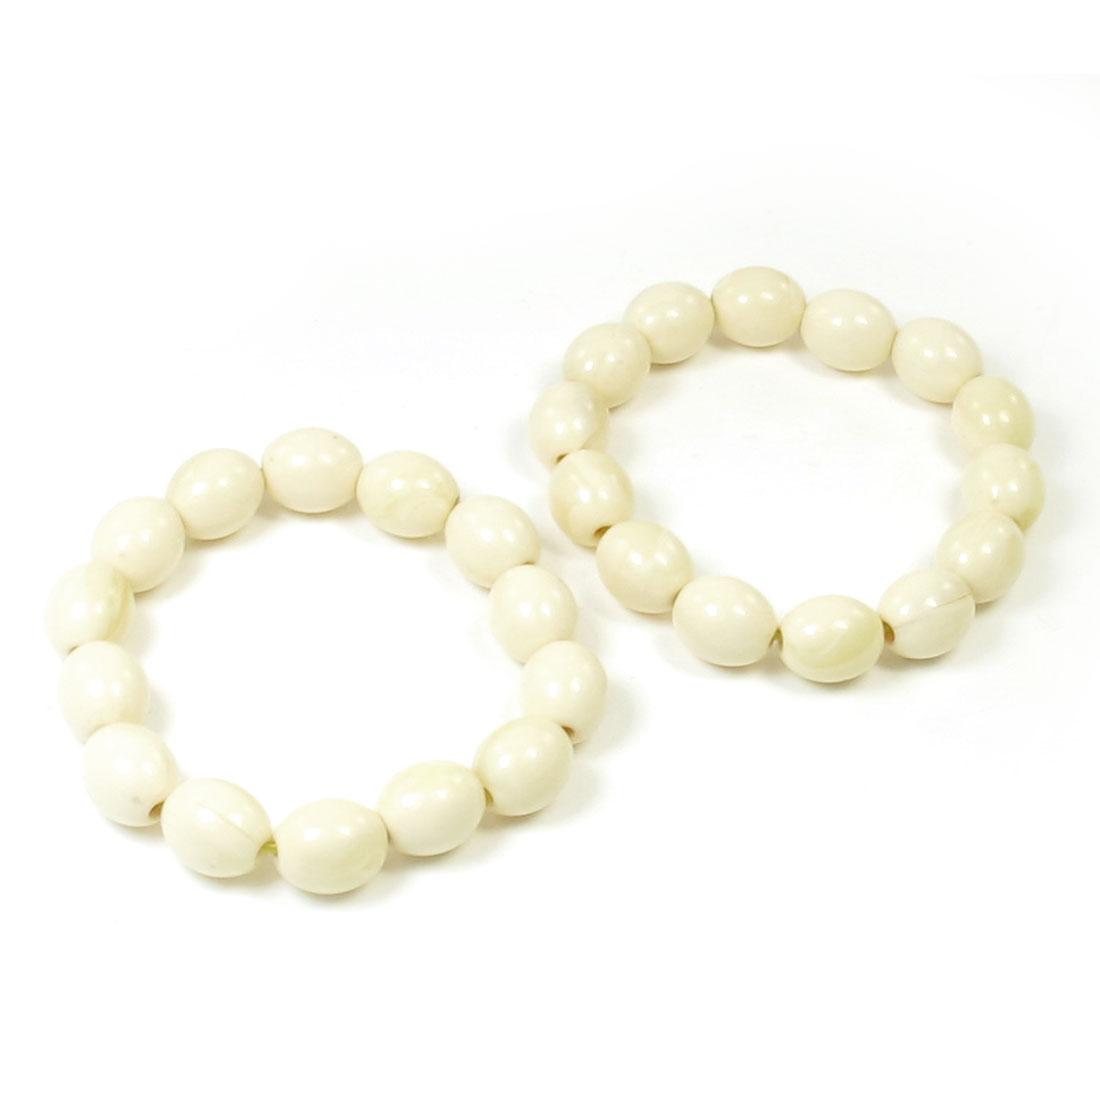 2pcs Ivory Plastic Oval Beads Linked Elastic Prayer Wrist Bracelet